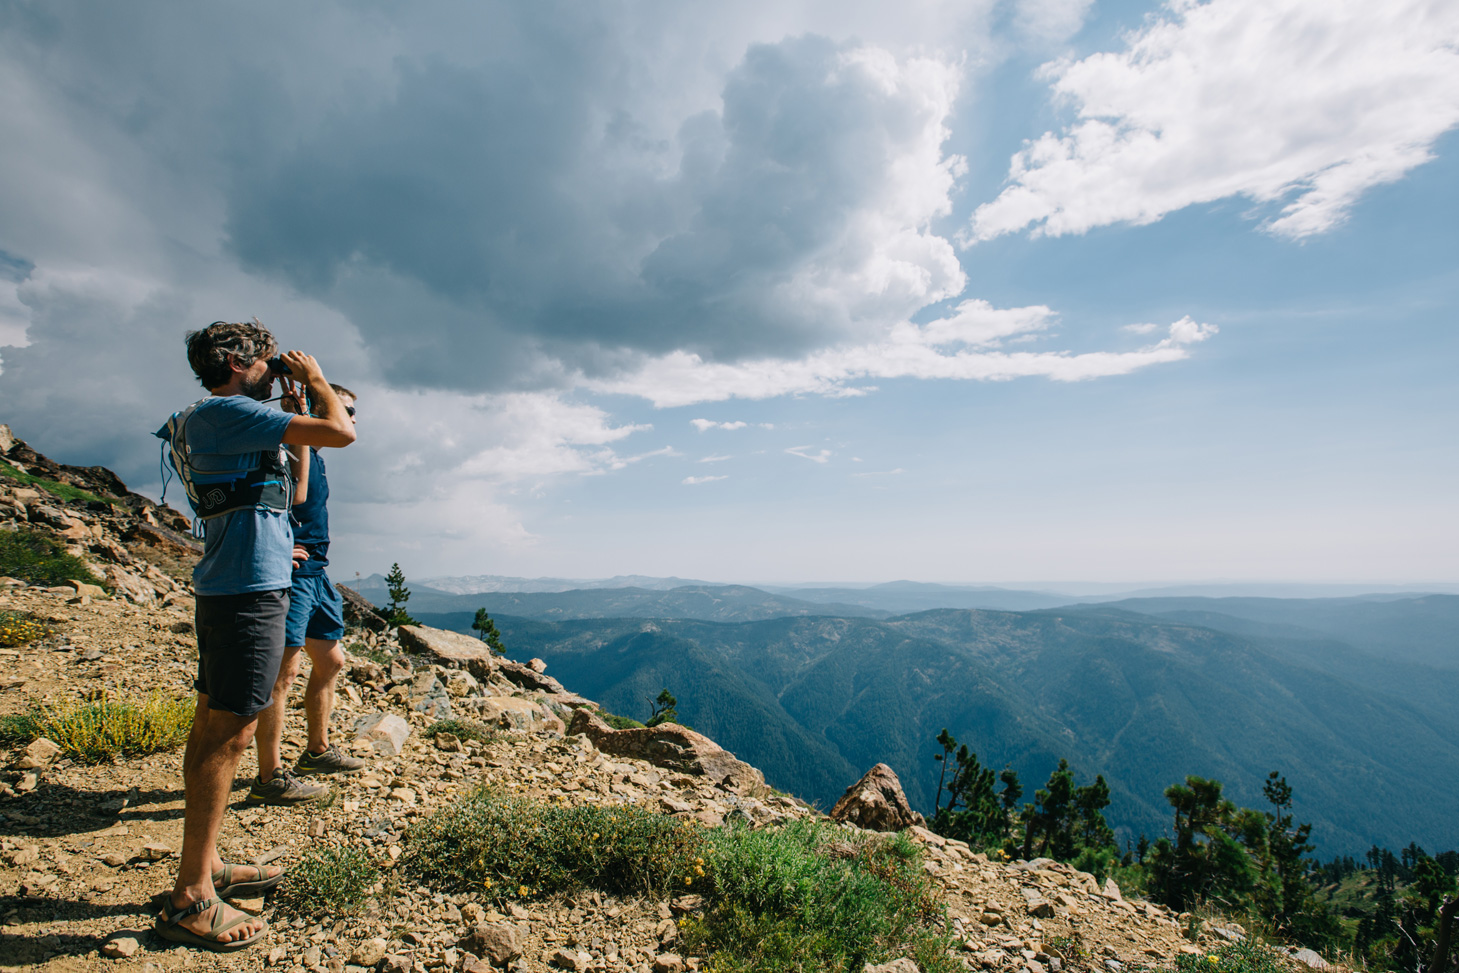 CindyGiovagnoli_outdoors_photographer_Sierra_Buttes_firetower_watchtower_Sardine_Snag_Bear_lake_hike_swim_camp-013.jpg